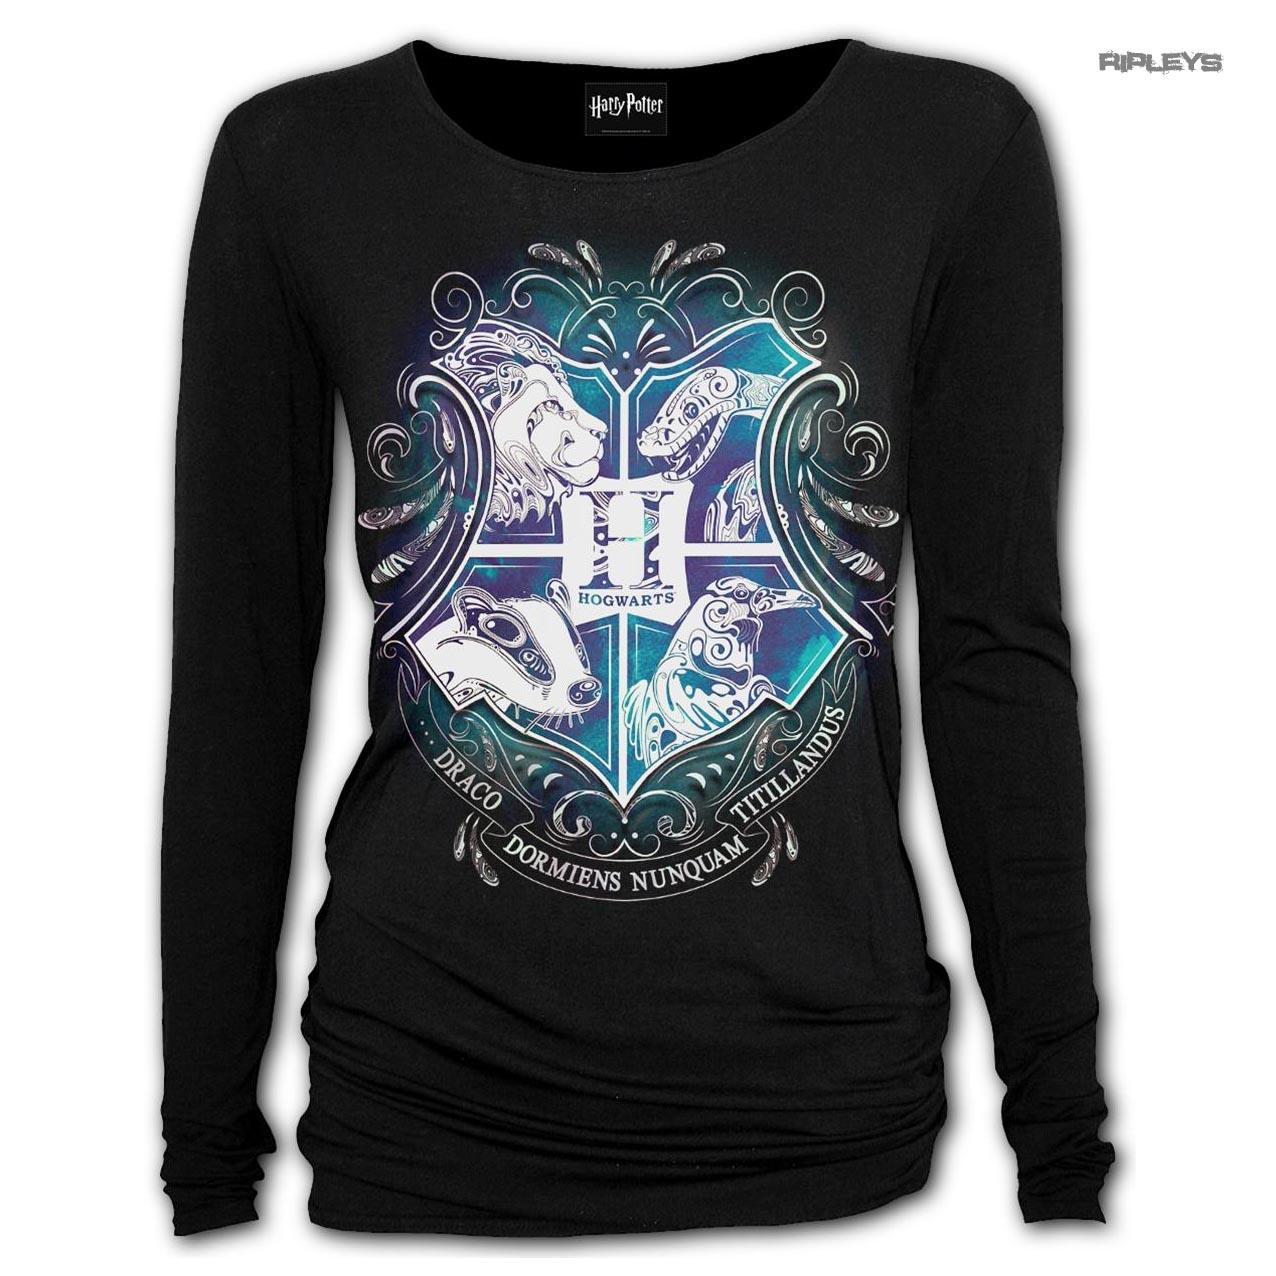 Spiral-Ladies-Black-Harry-Potter-HOGWARTS-Crest-L-Sleeve-Top-All-Sizes thumbnail 4